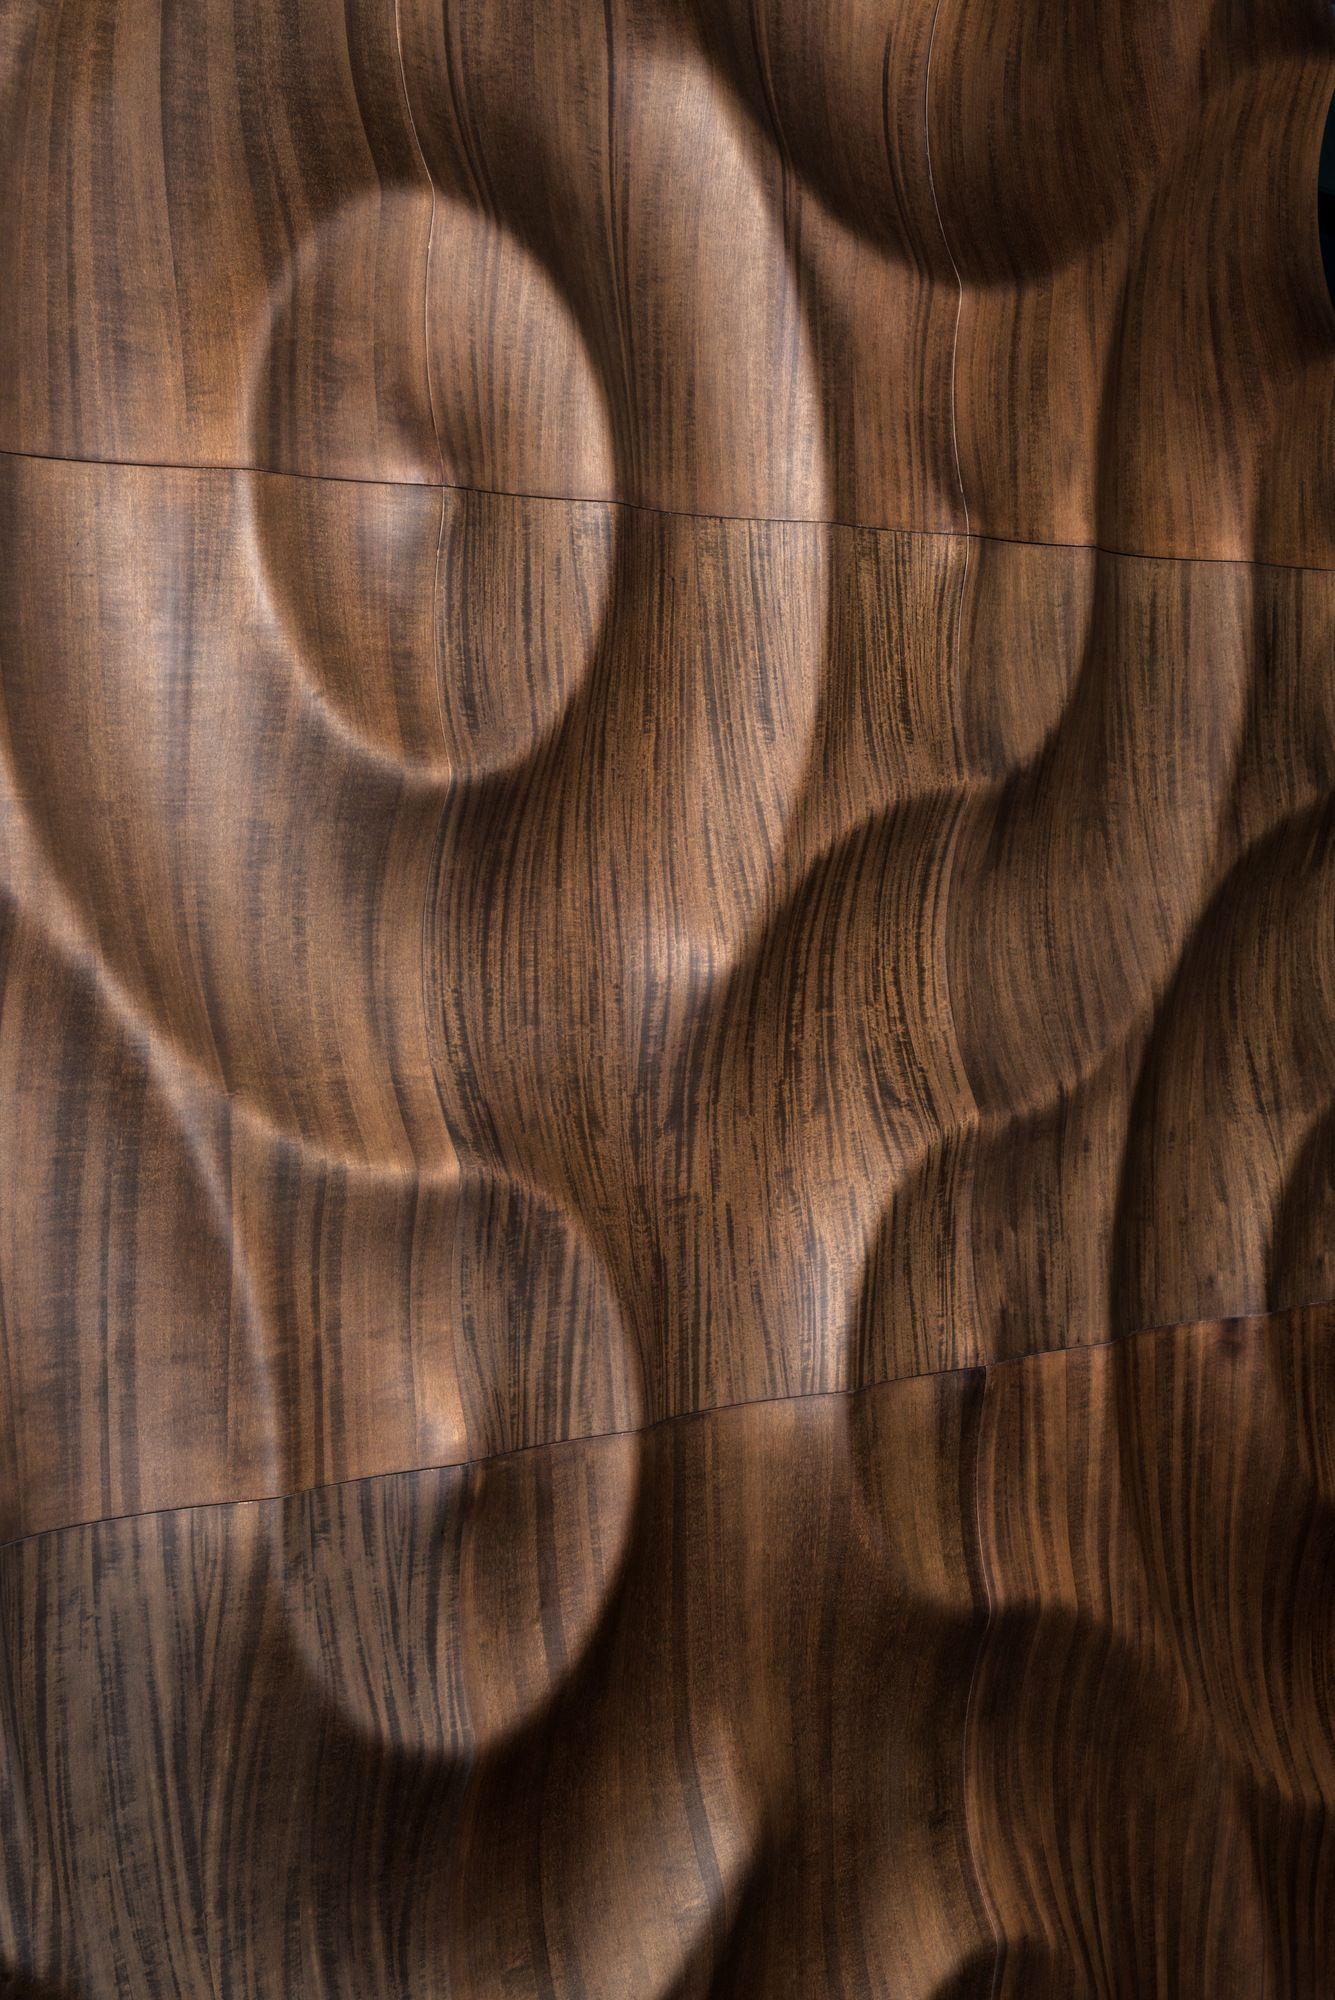 Modular Wooden 3d Wall Panel Amazonas By Moko Materials